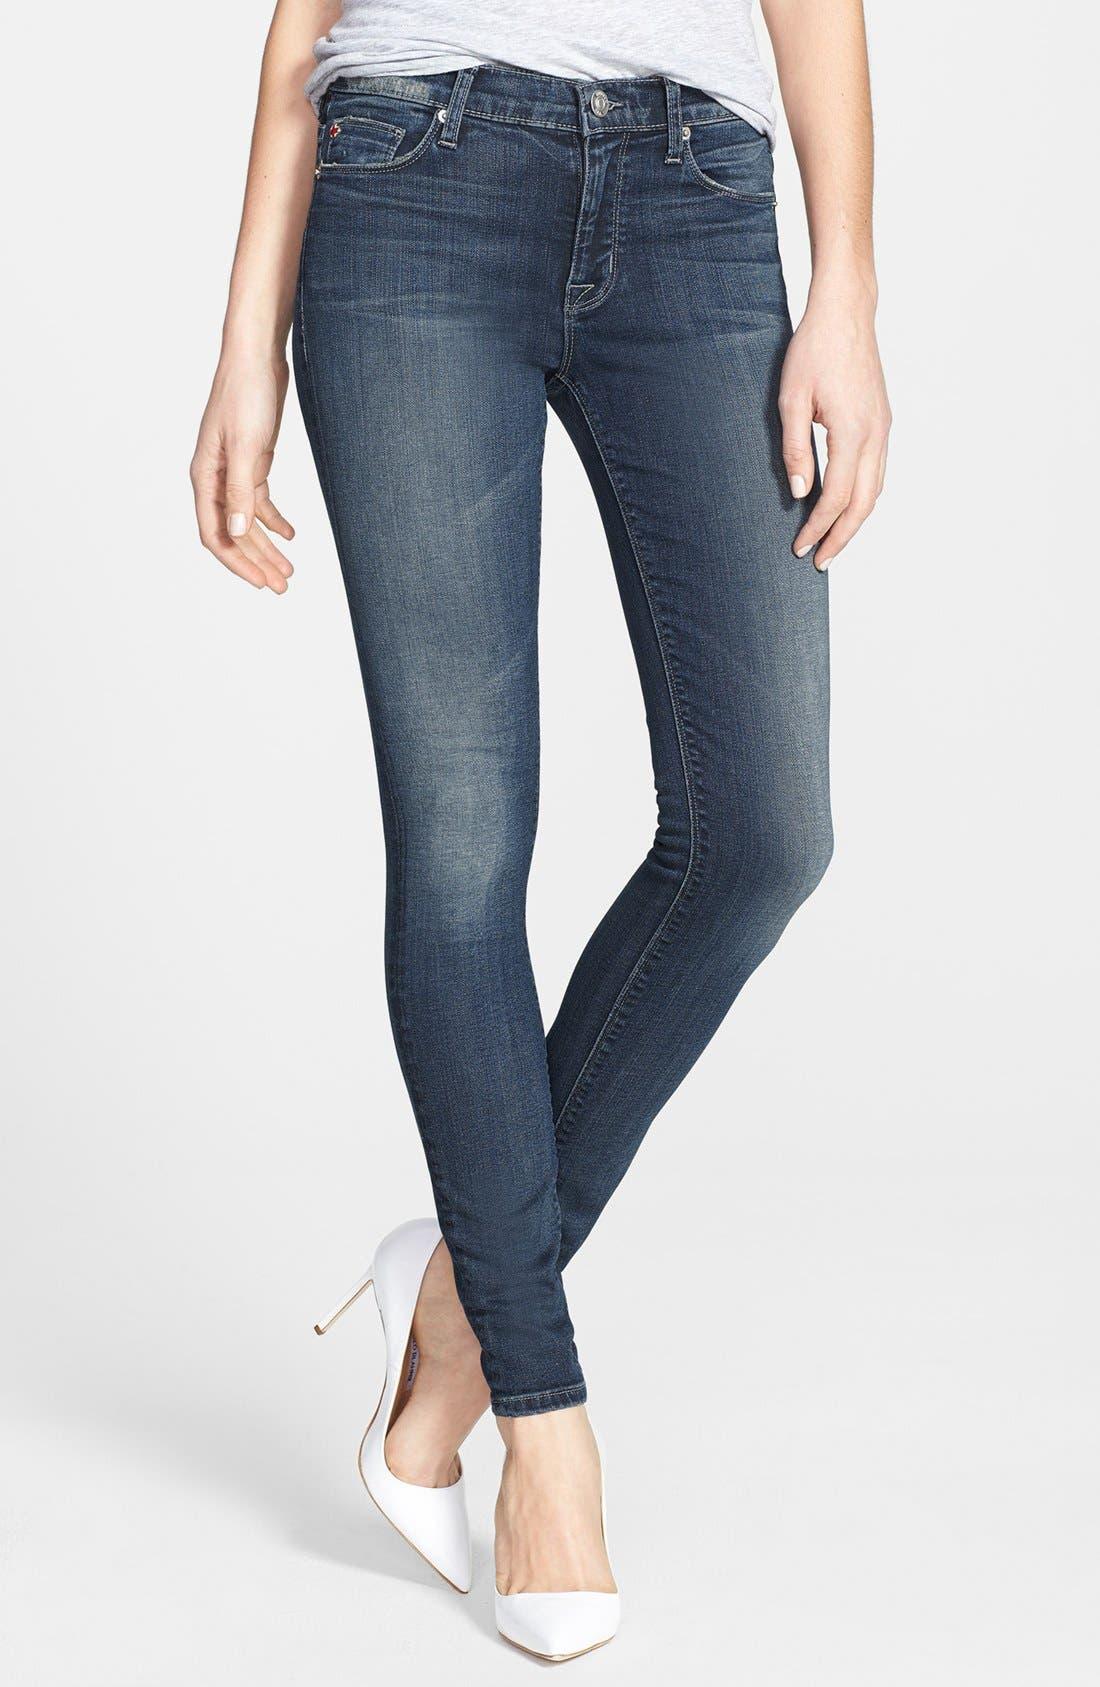 Main Image - Hudson Jeans 'Nico' Super Skinny Jeans (Epic Wash)